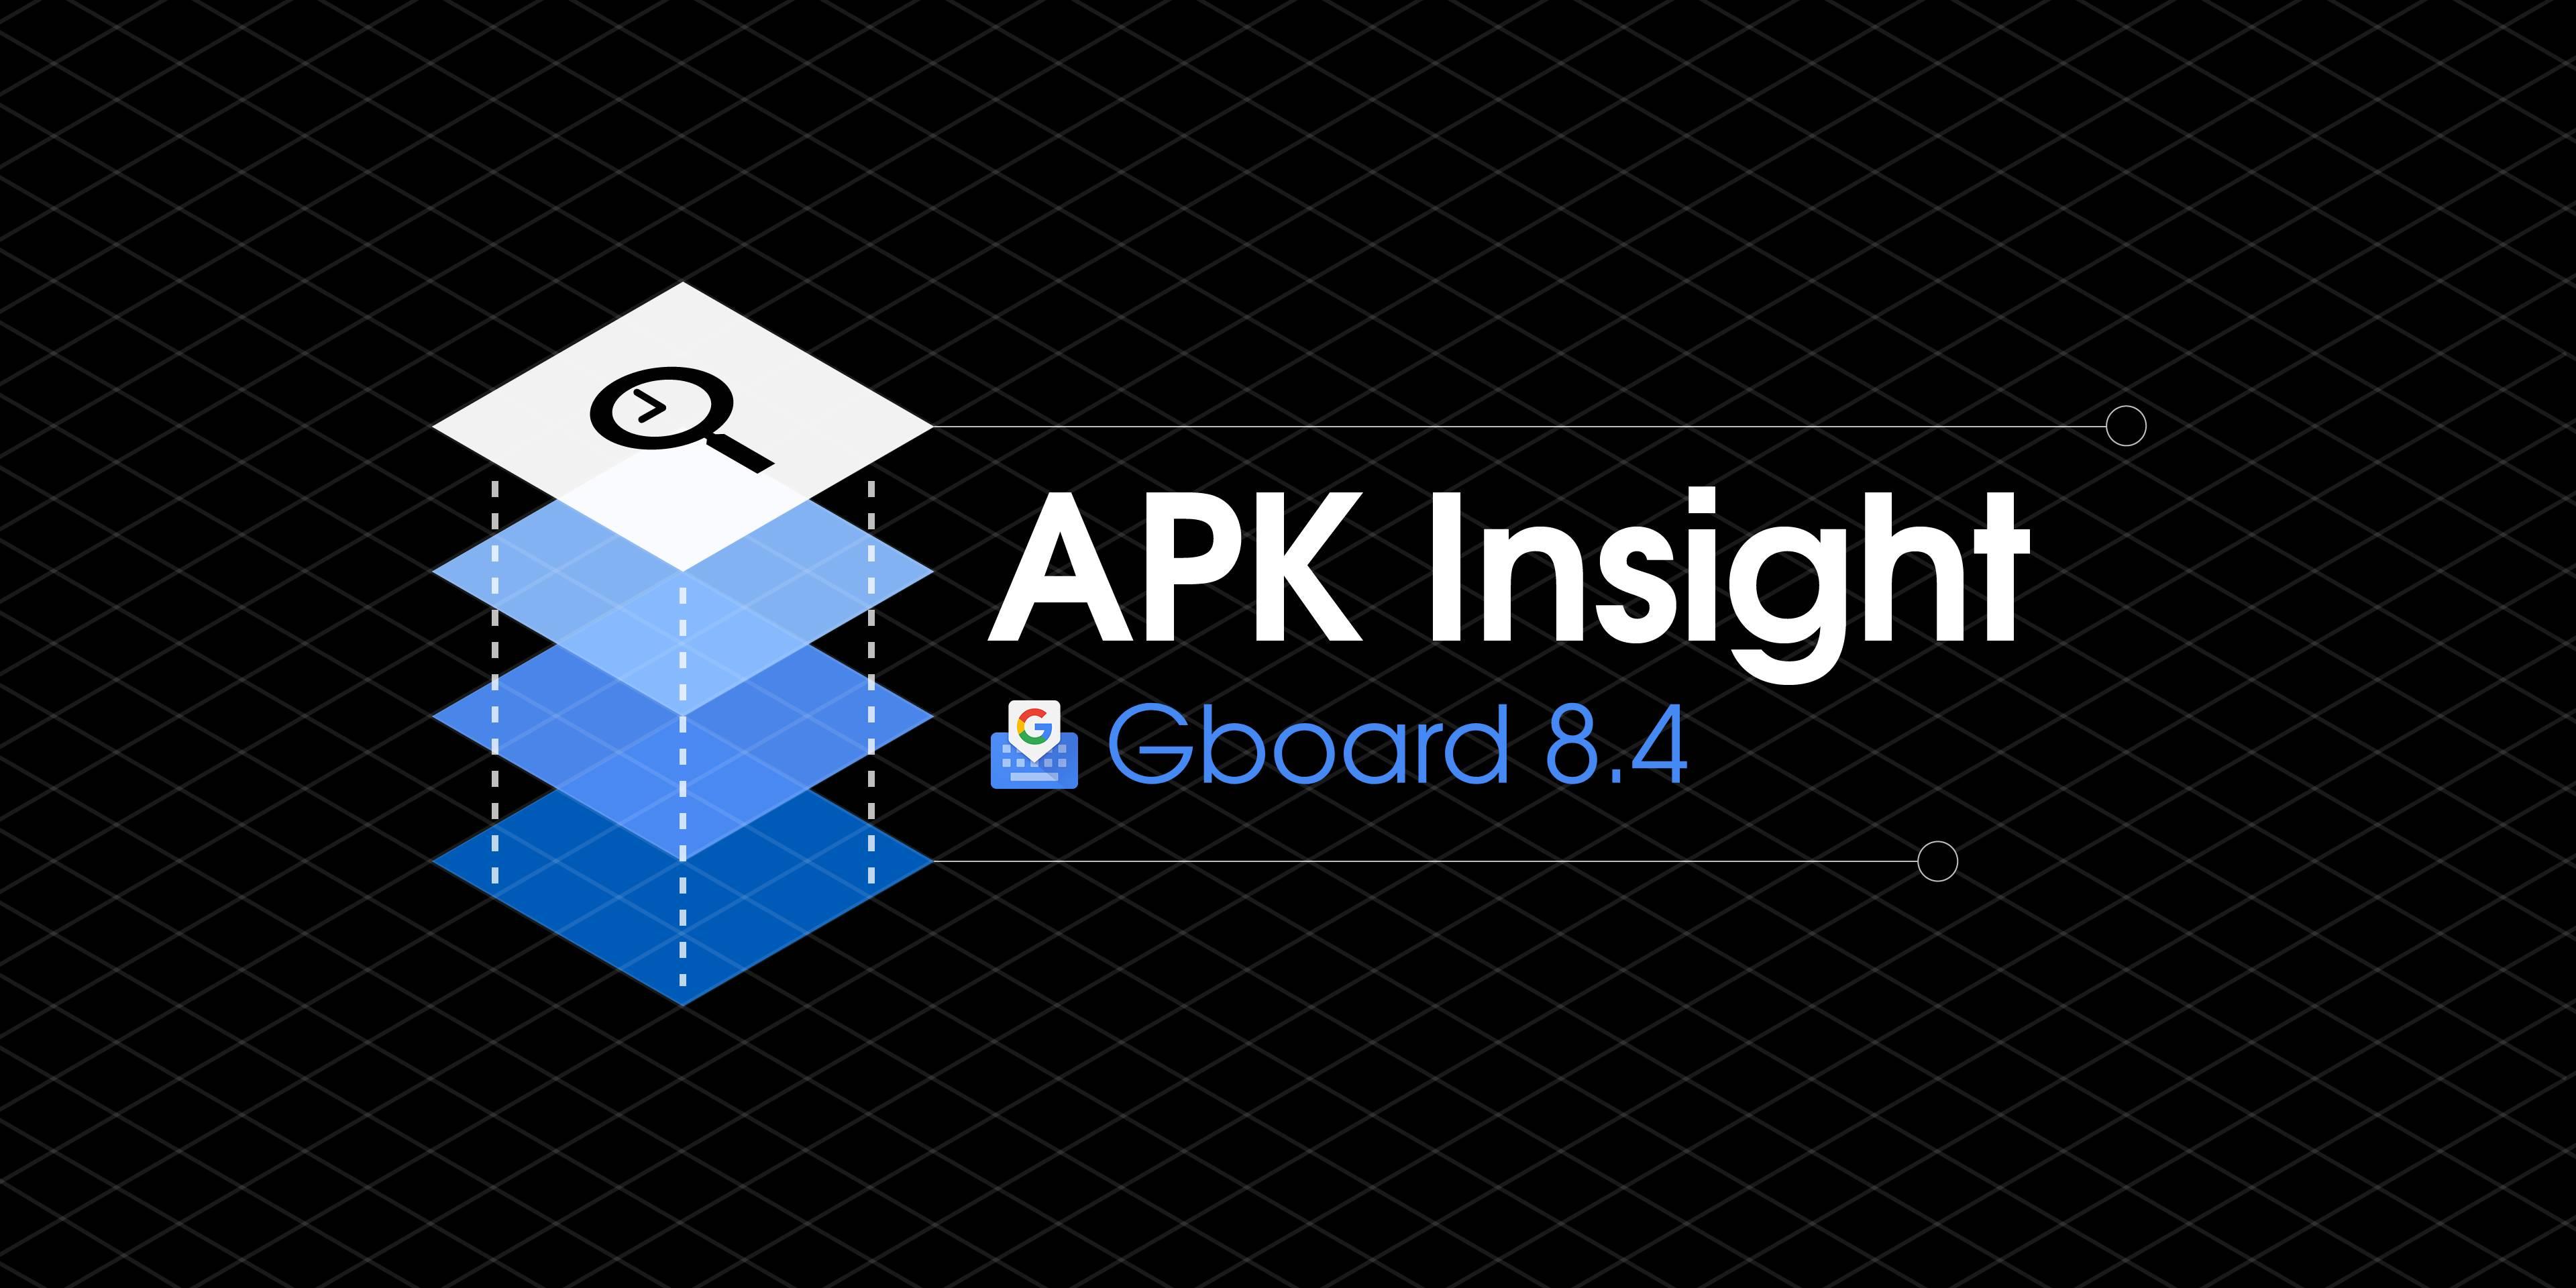 [Update: Dictionary import/export] Gboard 8.4 reorganizes 'Symbols' emoji, tweaks Incognito UI [APK Insight]